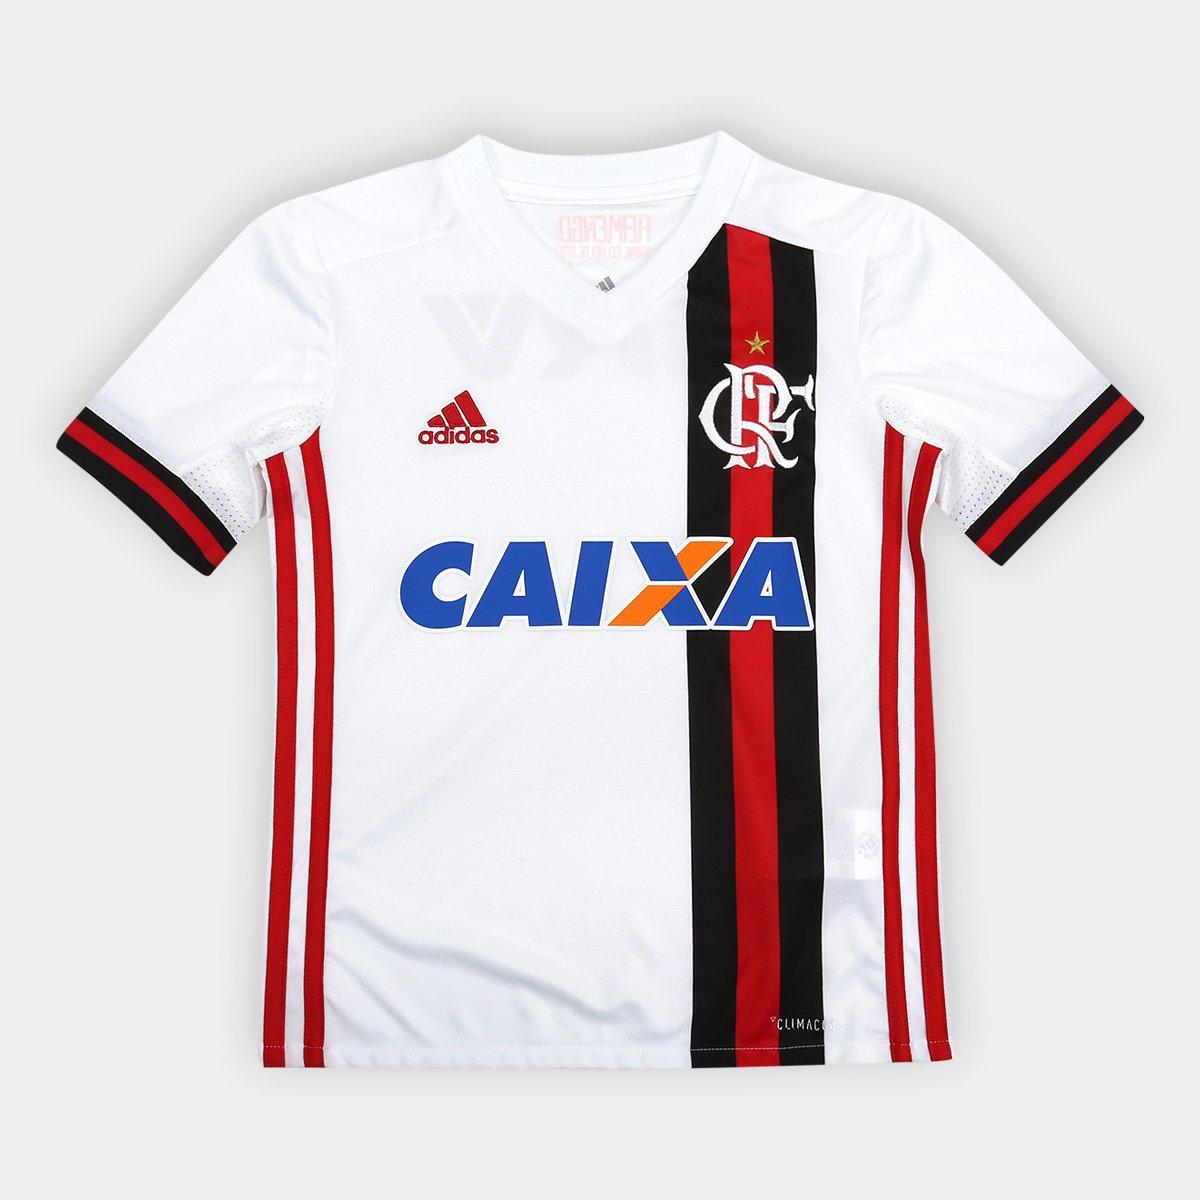 Camisa Flamengo Infantil II 17 18 s nº c  Patrocínio - Torcedor Adidas ... 62a1a8f879e50